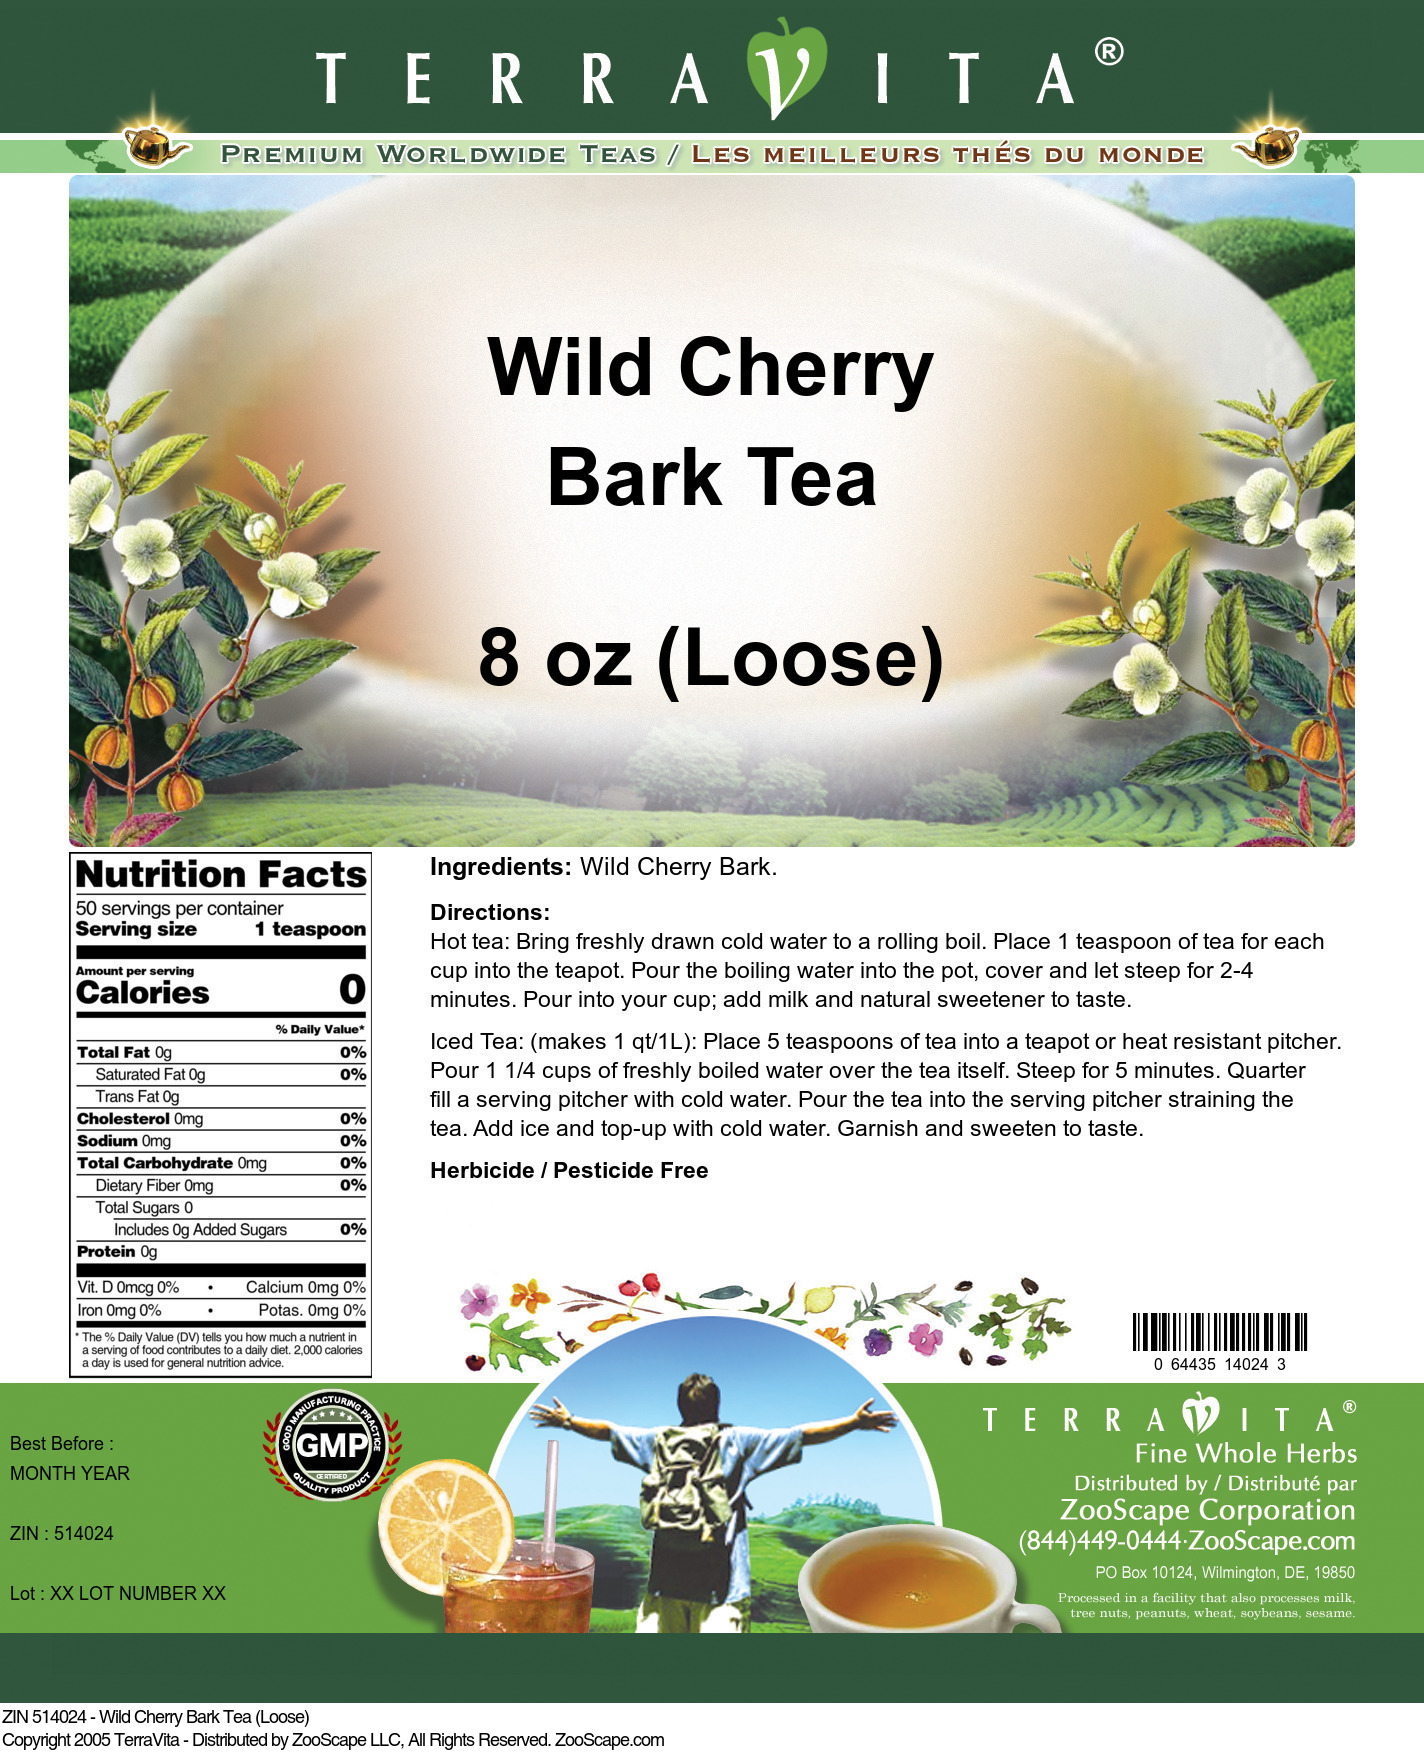 Wild Cherry Bark Tea (Loose)